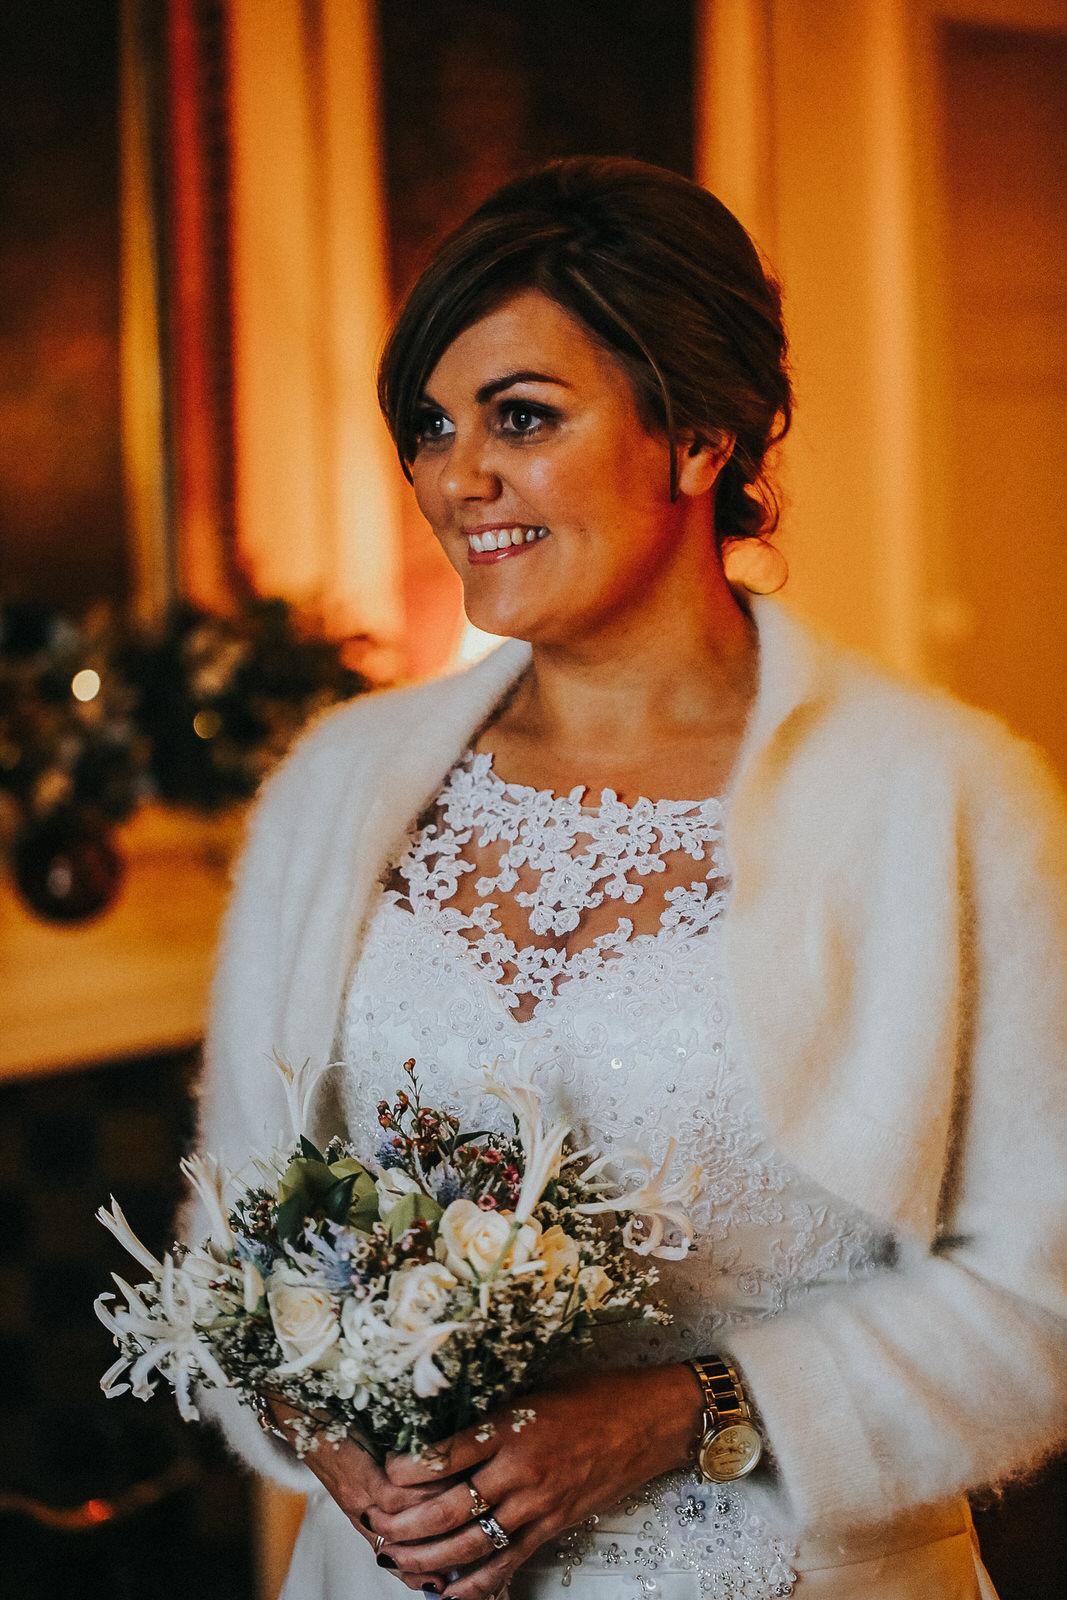 Roger_Kenny_wedding_photographer_Tankardstown_590.jpg